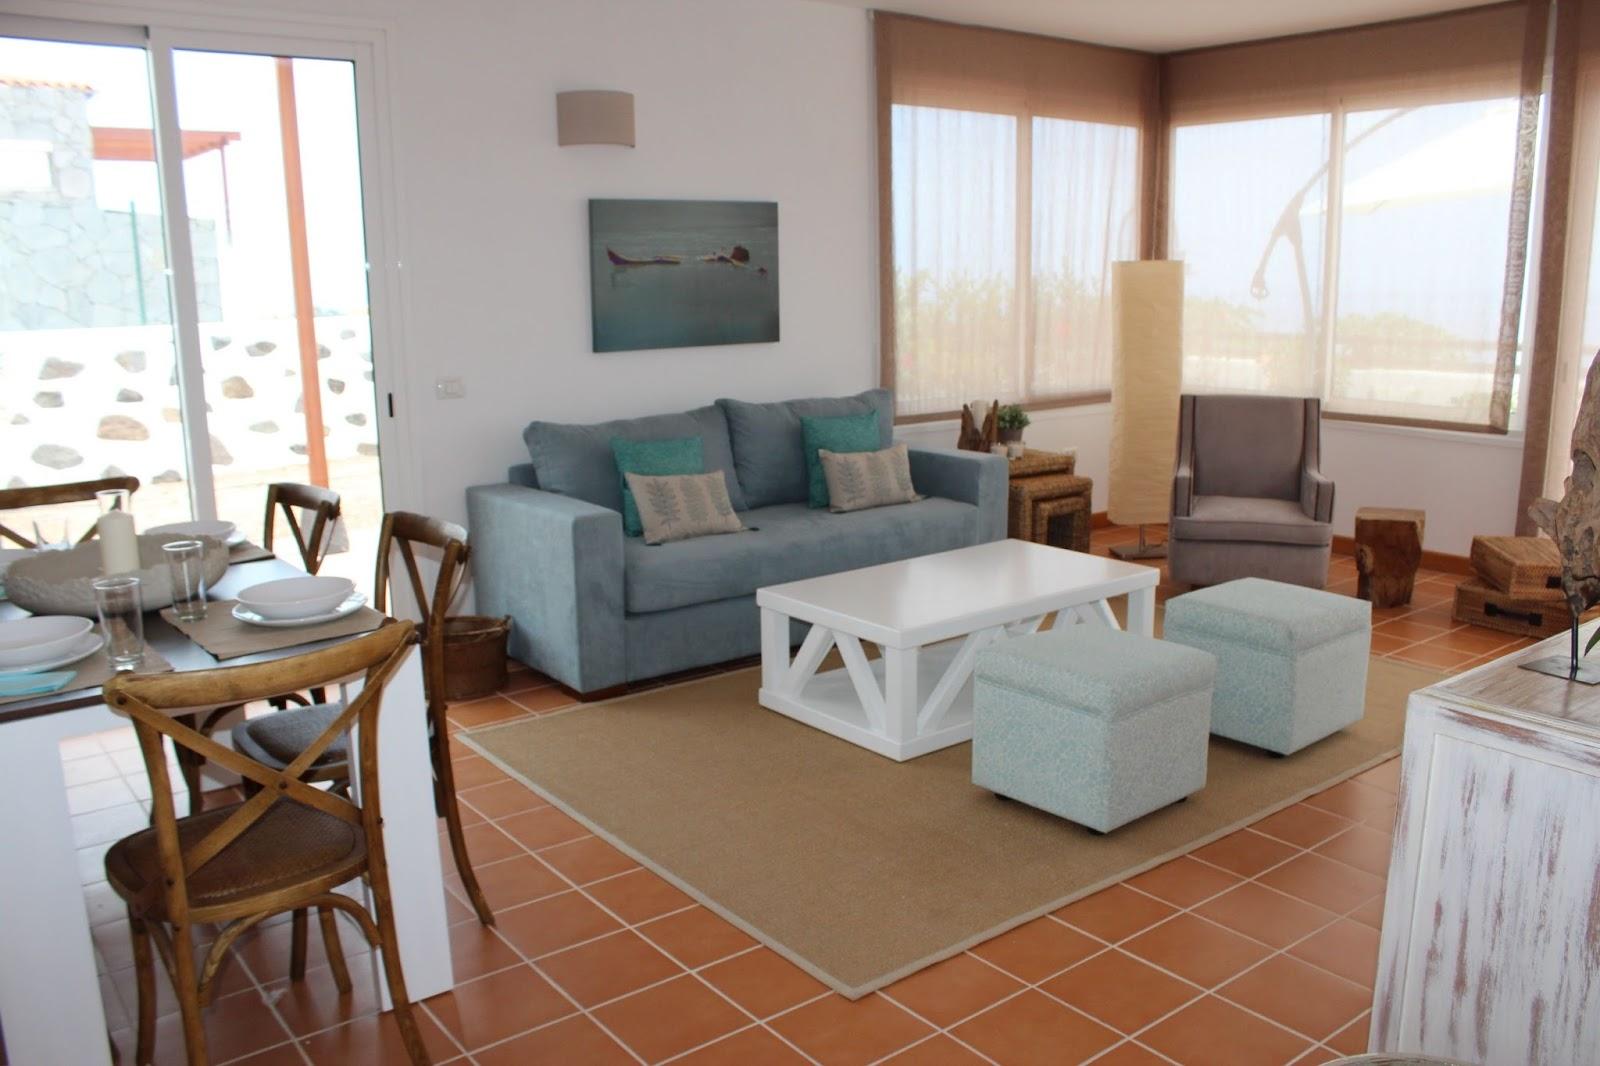 Tatiana doria decoraci n de viviendas el sal n for Decoracion de viviendas